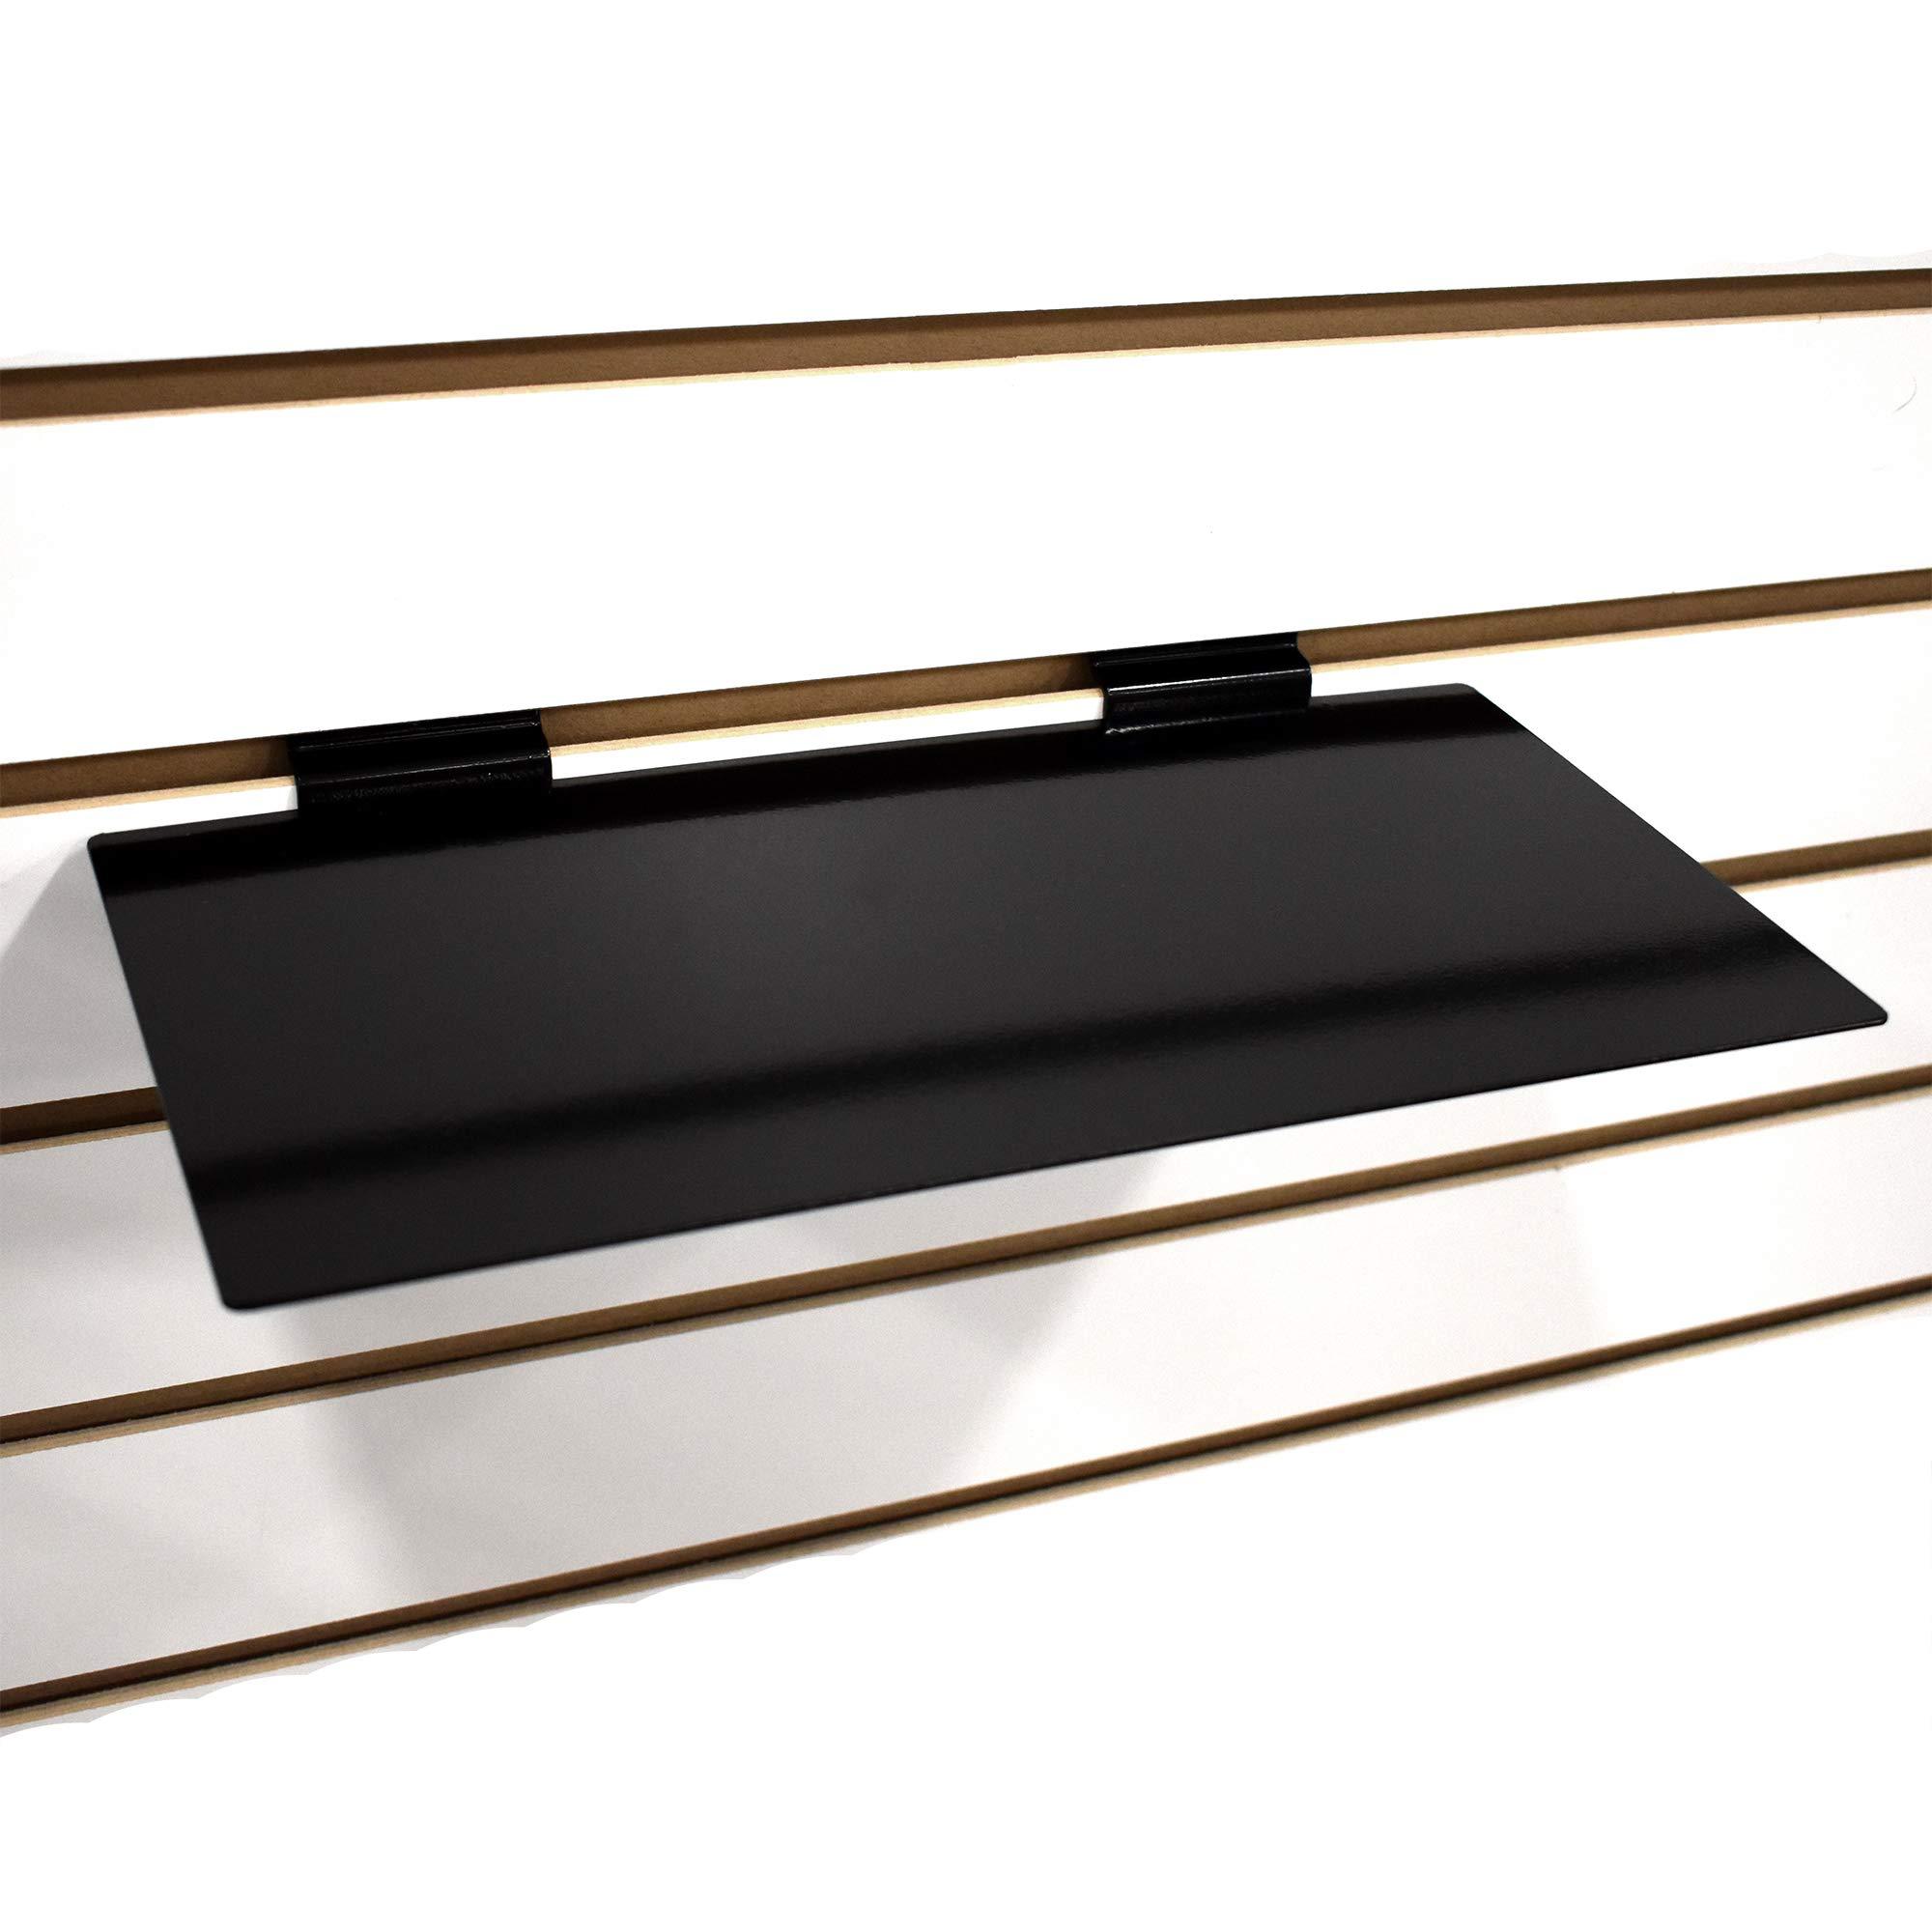 Black Slatwall Metal Large Shoe Shelf, Flat Display Shelves for Slat - 6'' D X 12'' L - 10 Pack